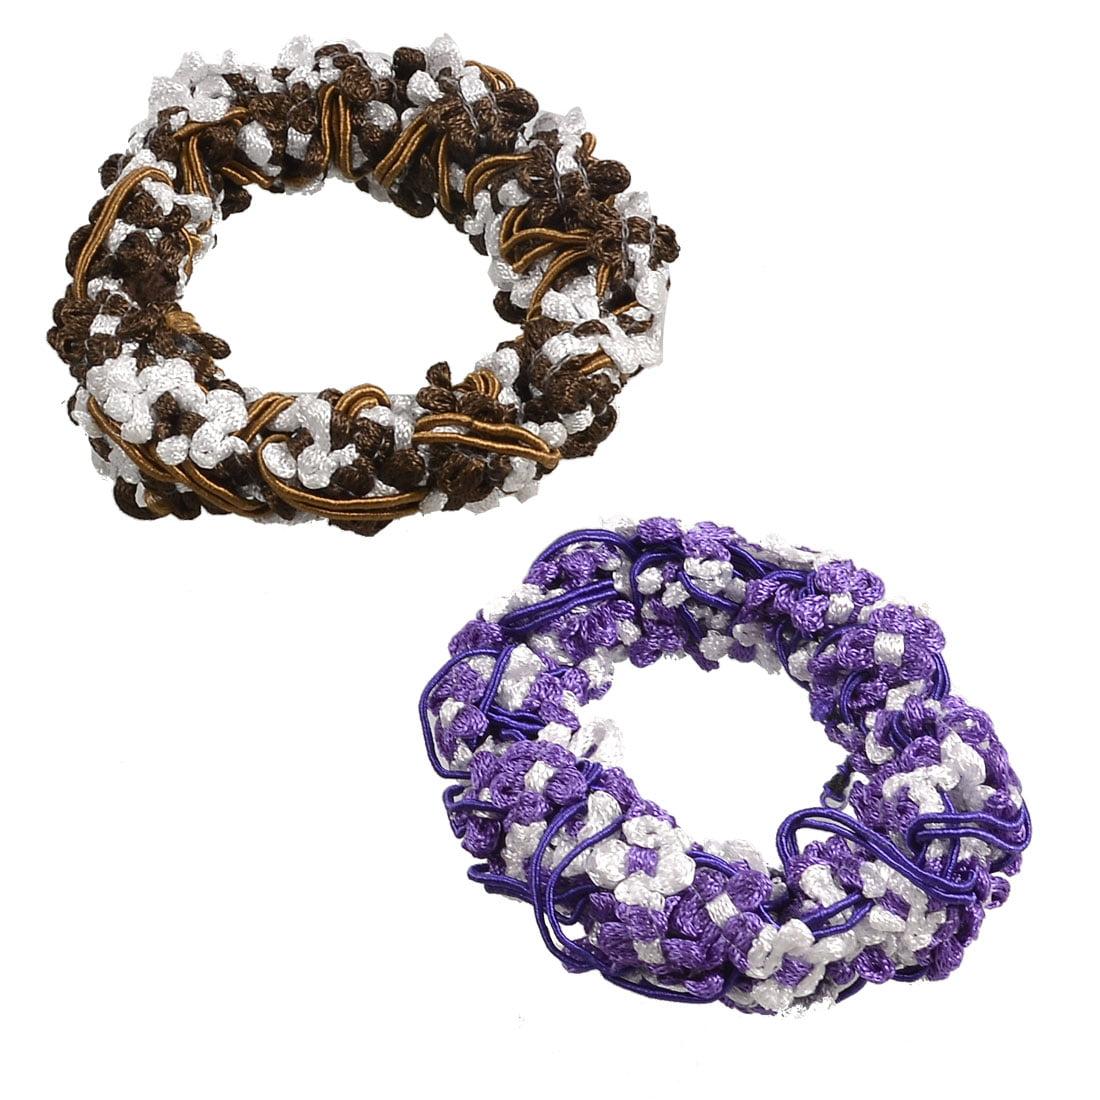 Unique Bargains 2 Pcs Stretchy Fabric Hair Ties Bands Ponytail Braid Holder Elastics Purple Brown